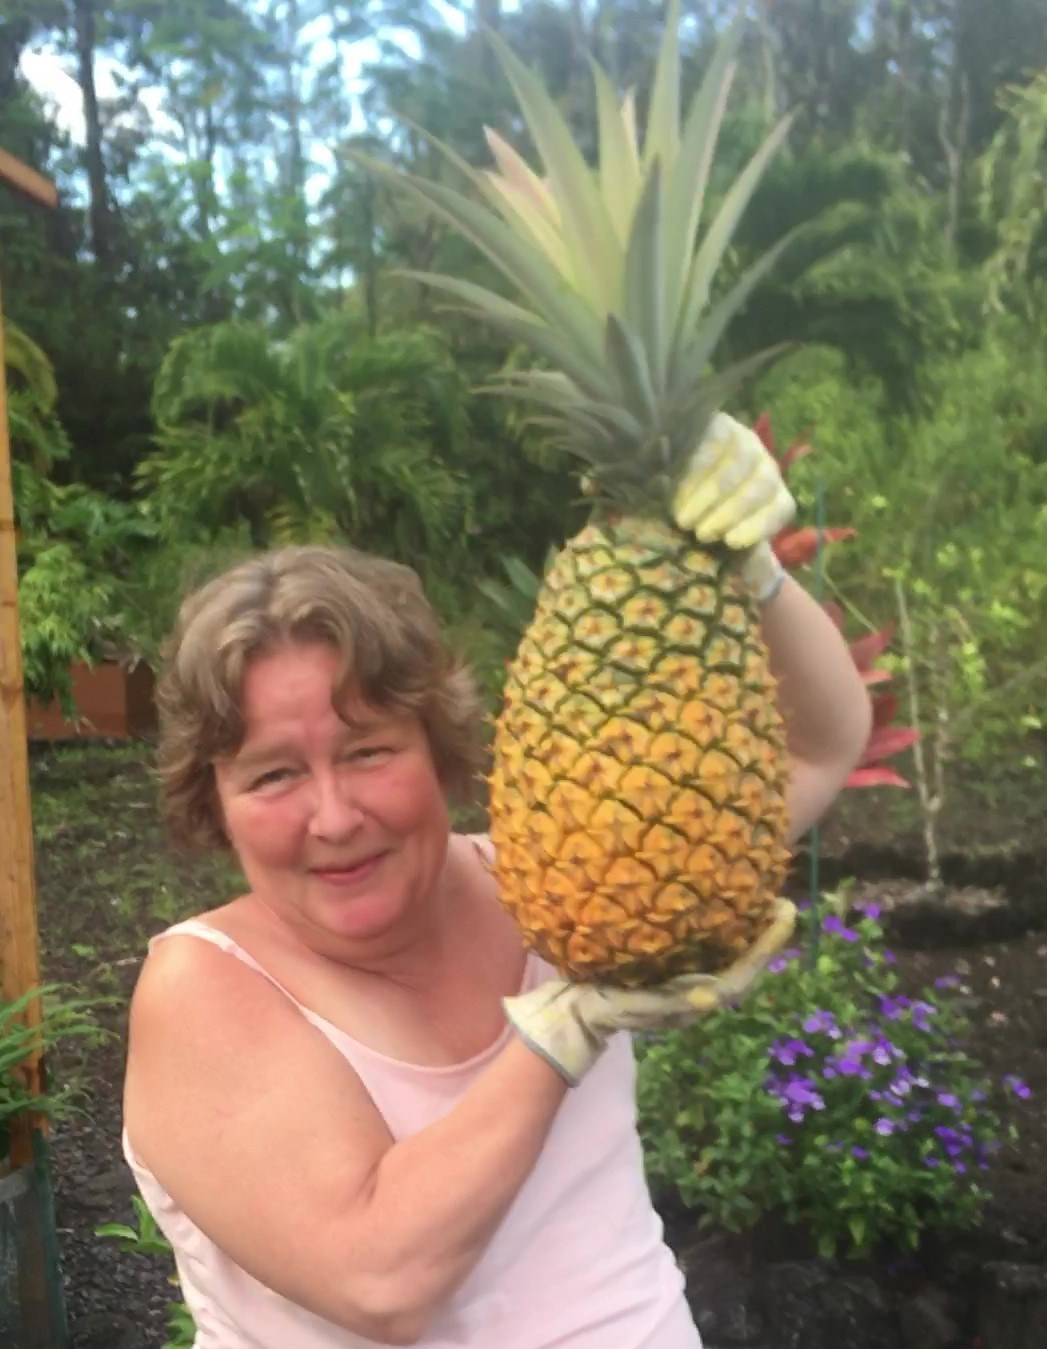 Me pineapple